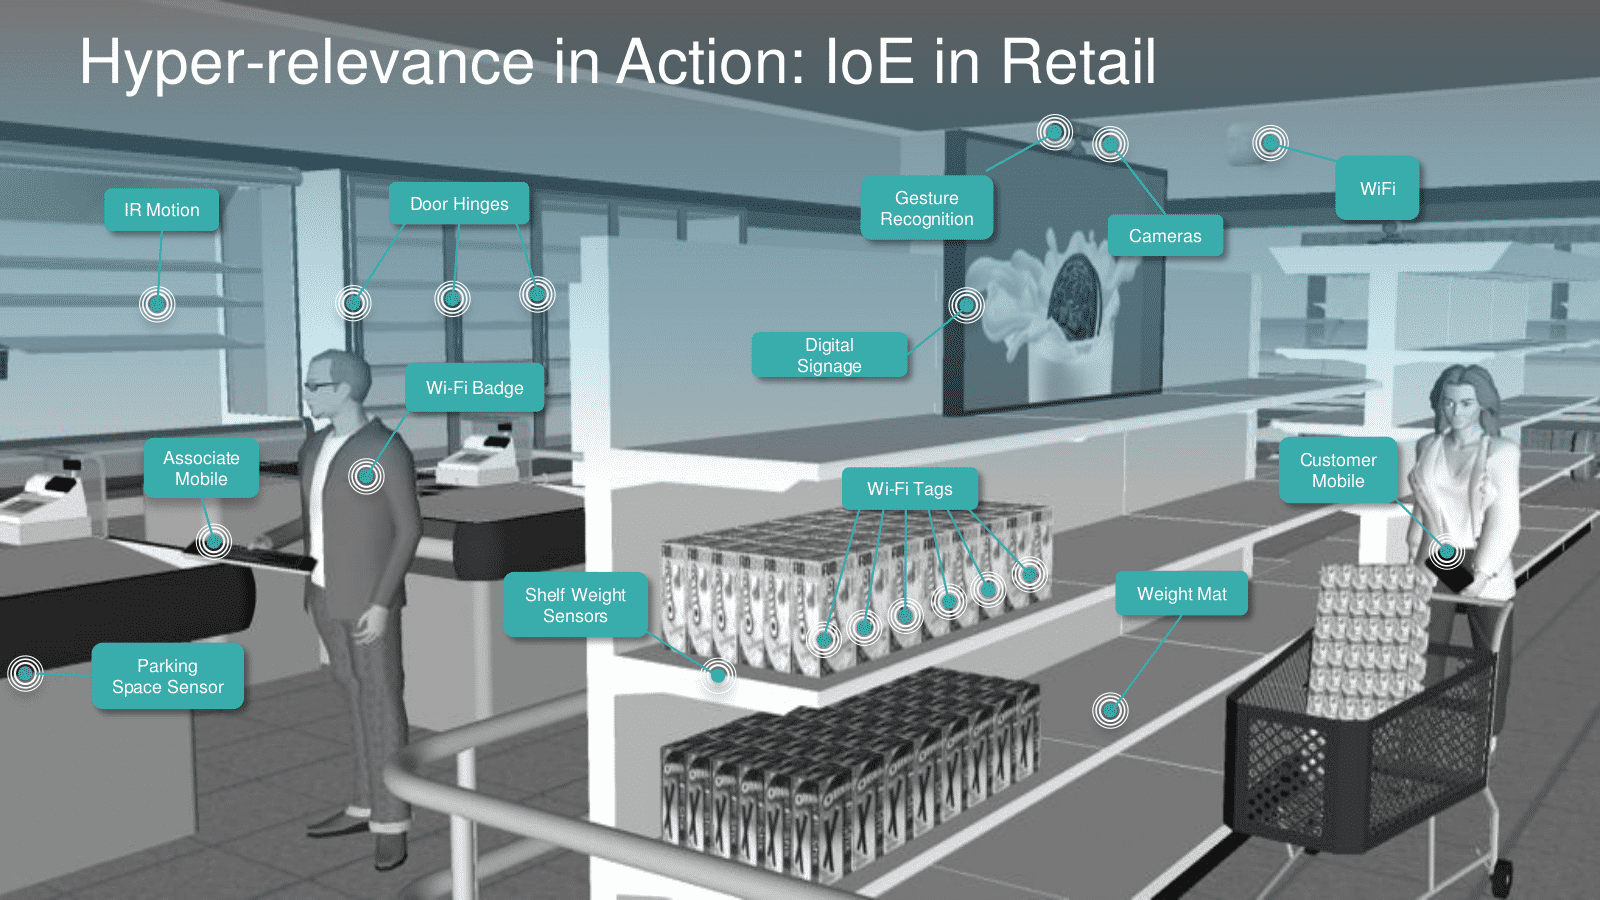 Cisco IoE Supermarkt